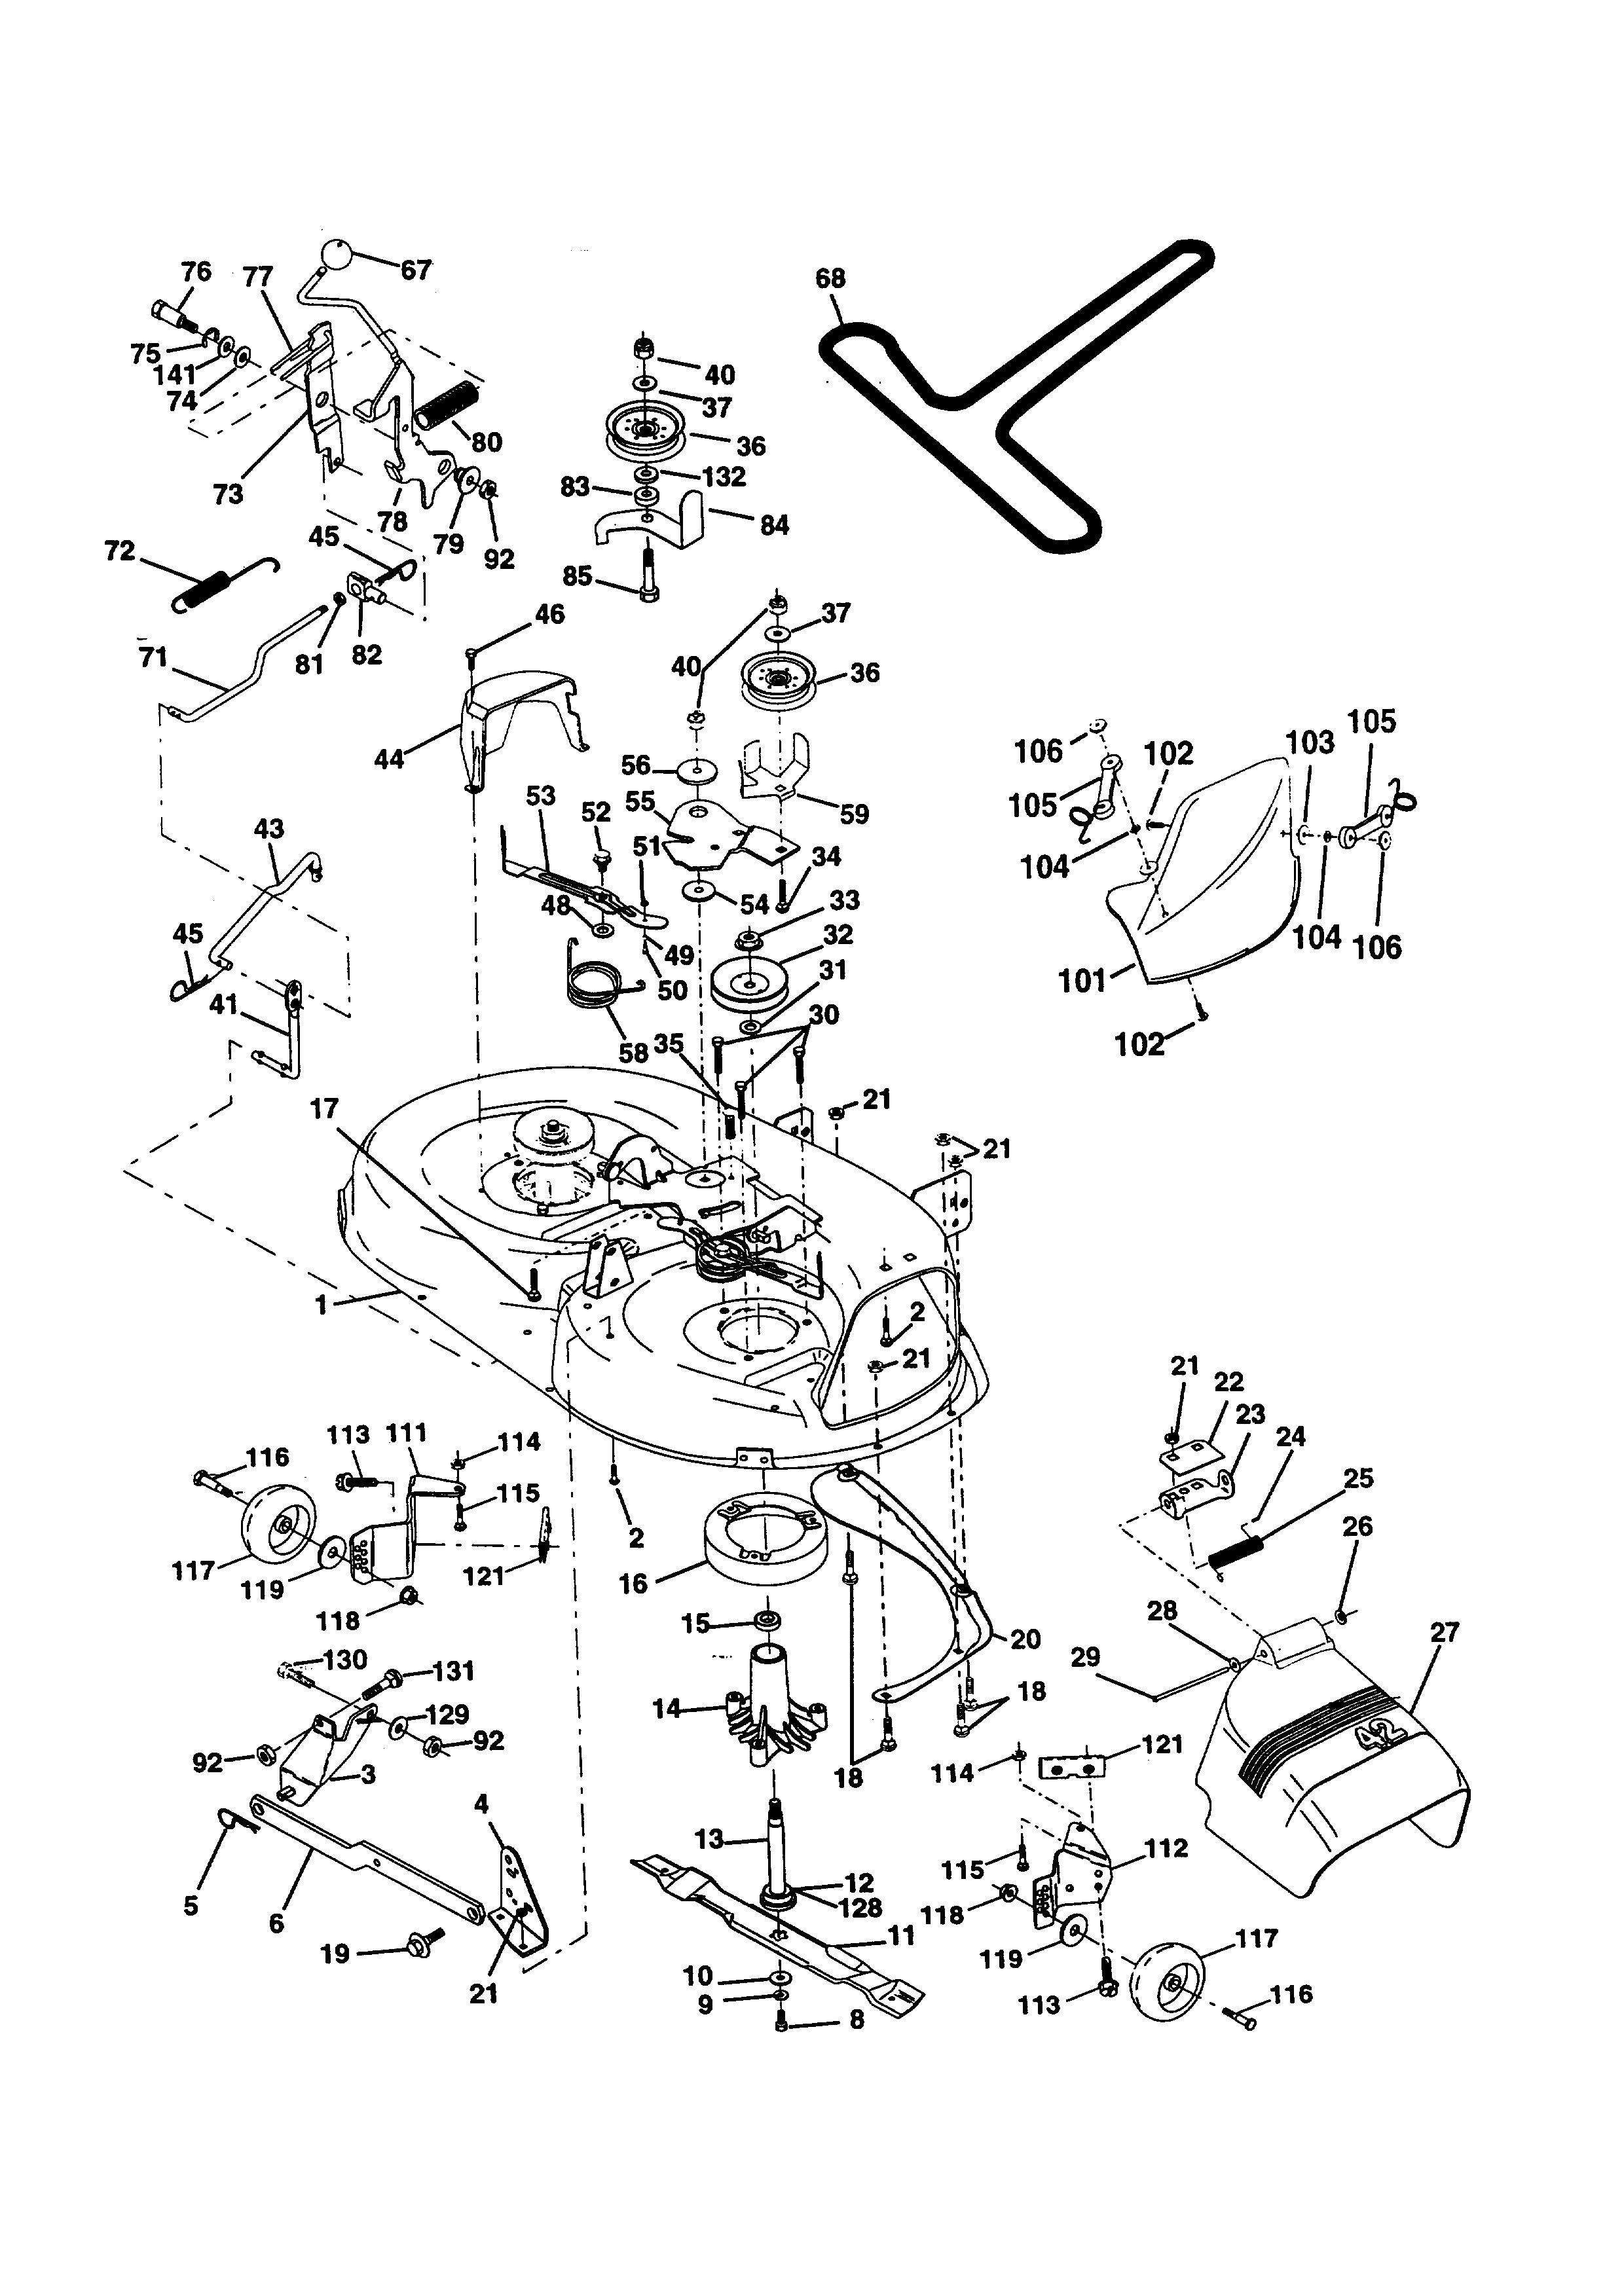 Lawn Mower Engine Diagram Rasenmher Zubehr 119 7845 Toro Kawasaki Diagrams Western Auto Model Ayp9187b89 Tractor Genuine Parts Of